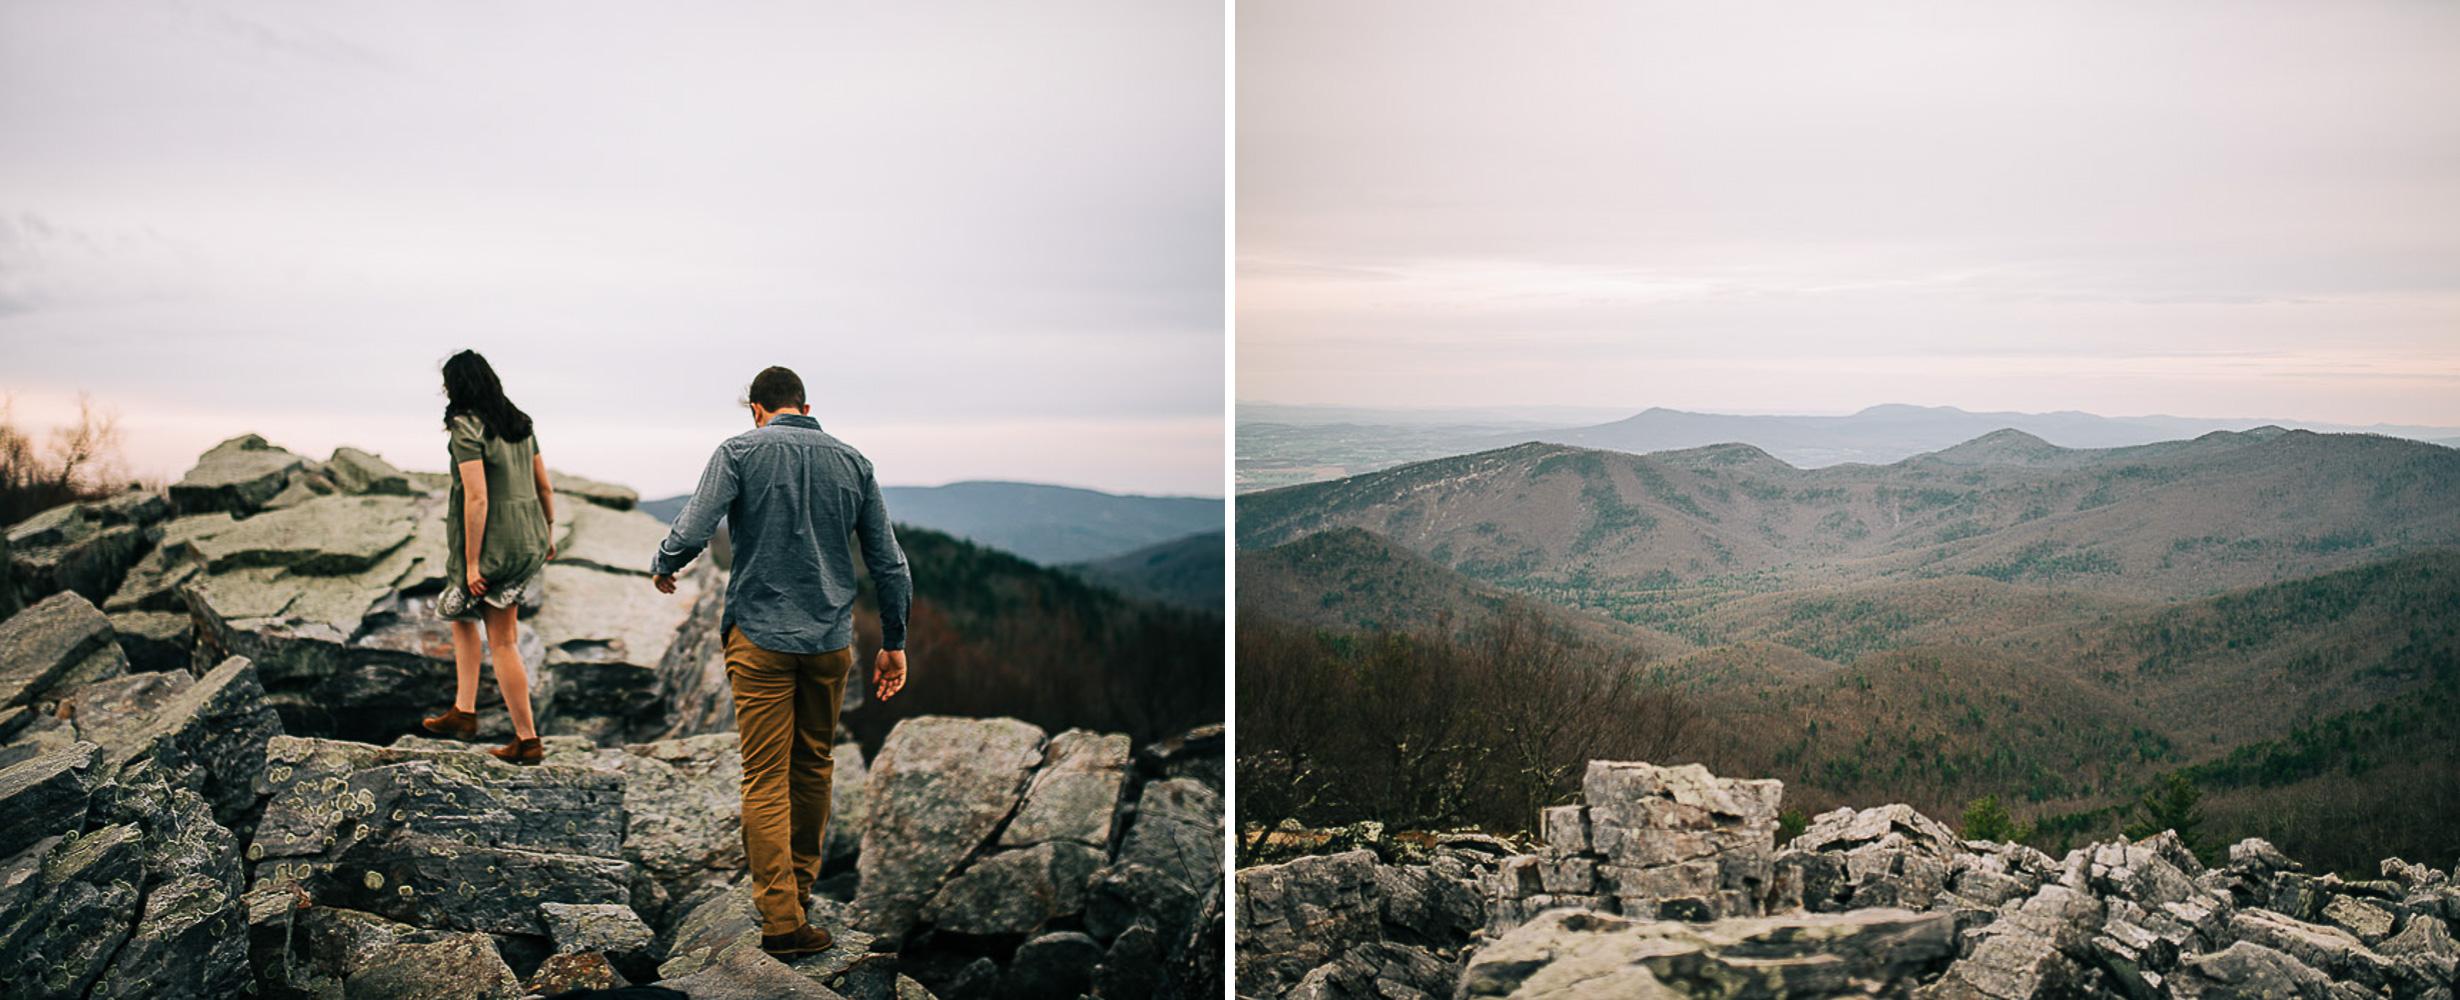 Sunrise Portriats, Mountain Portraits, Engagement Portraits, Anniversary Portraits, Summer Mast Photography 08.jpg